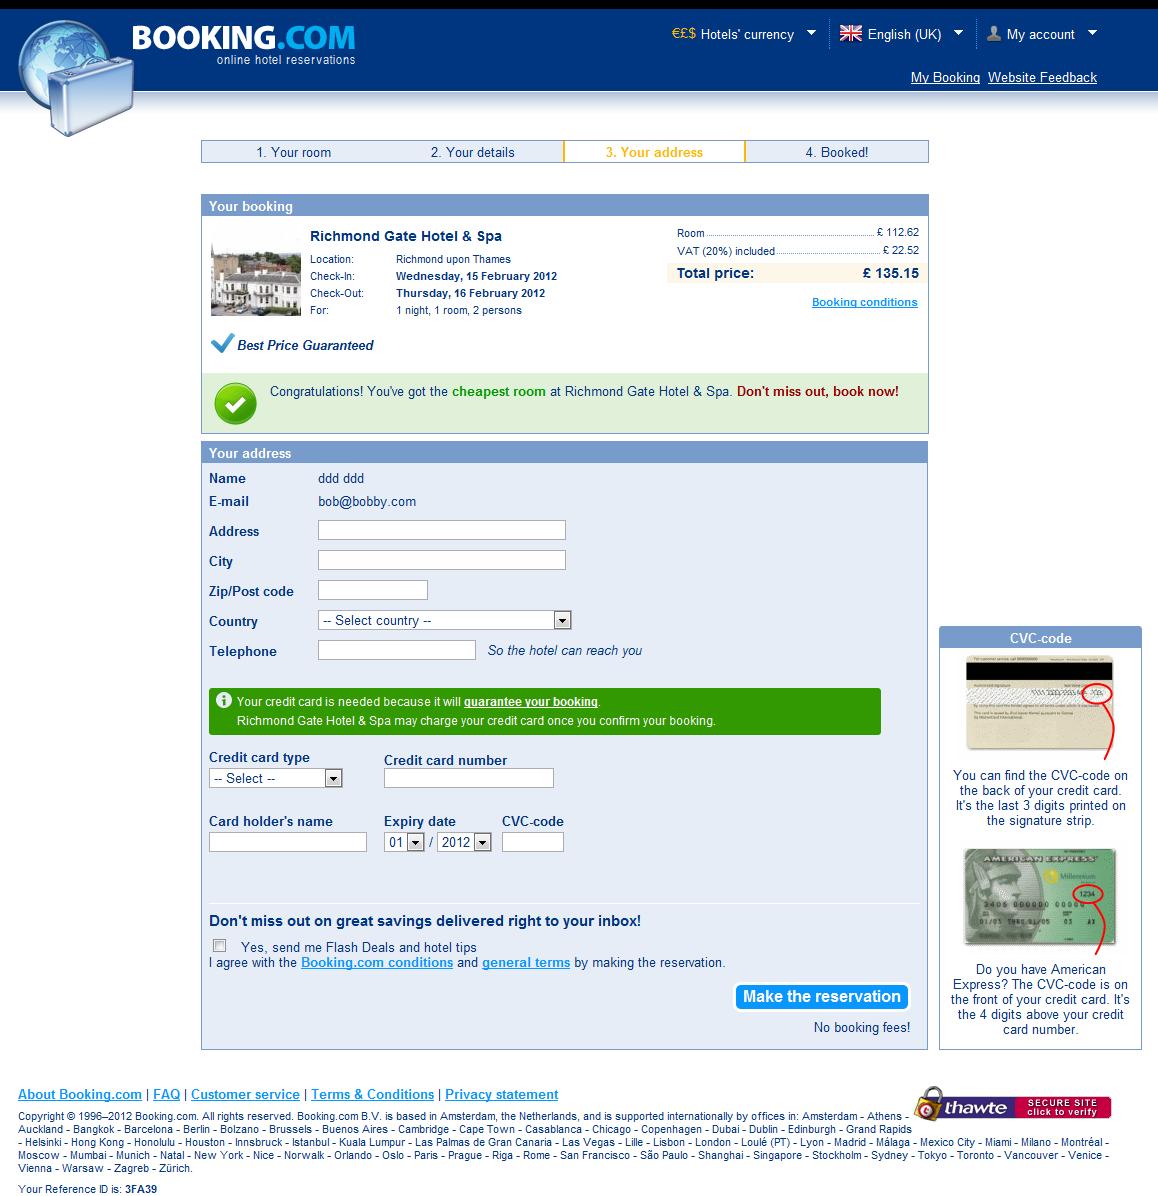 Booking.com: Contact info